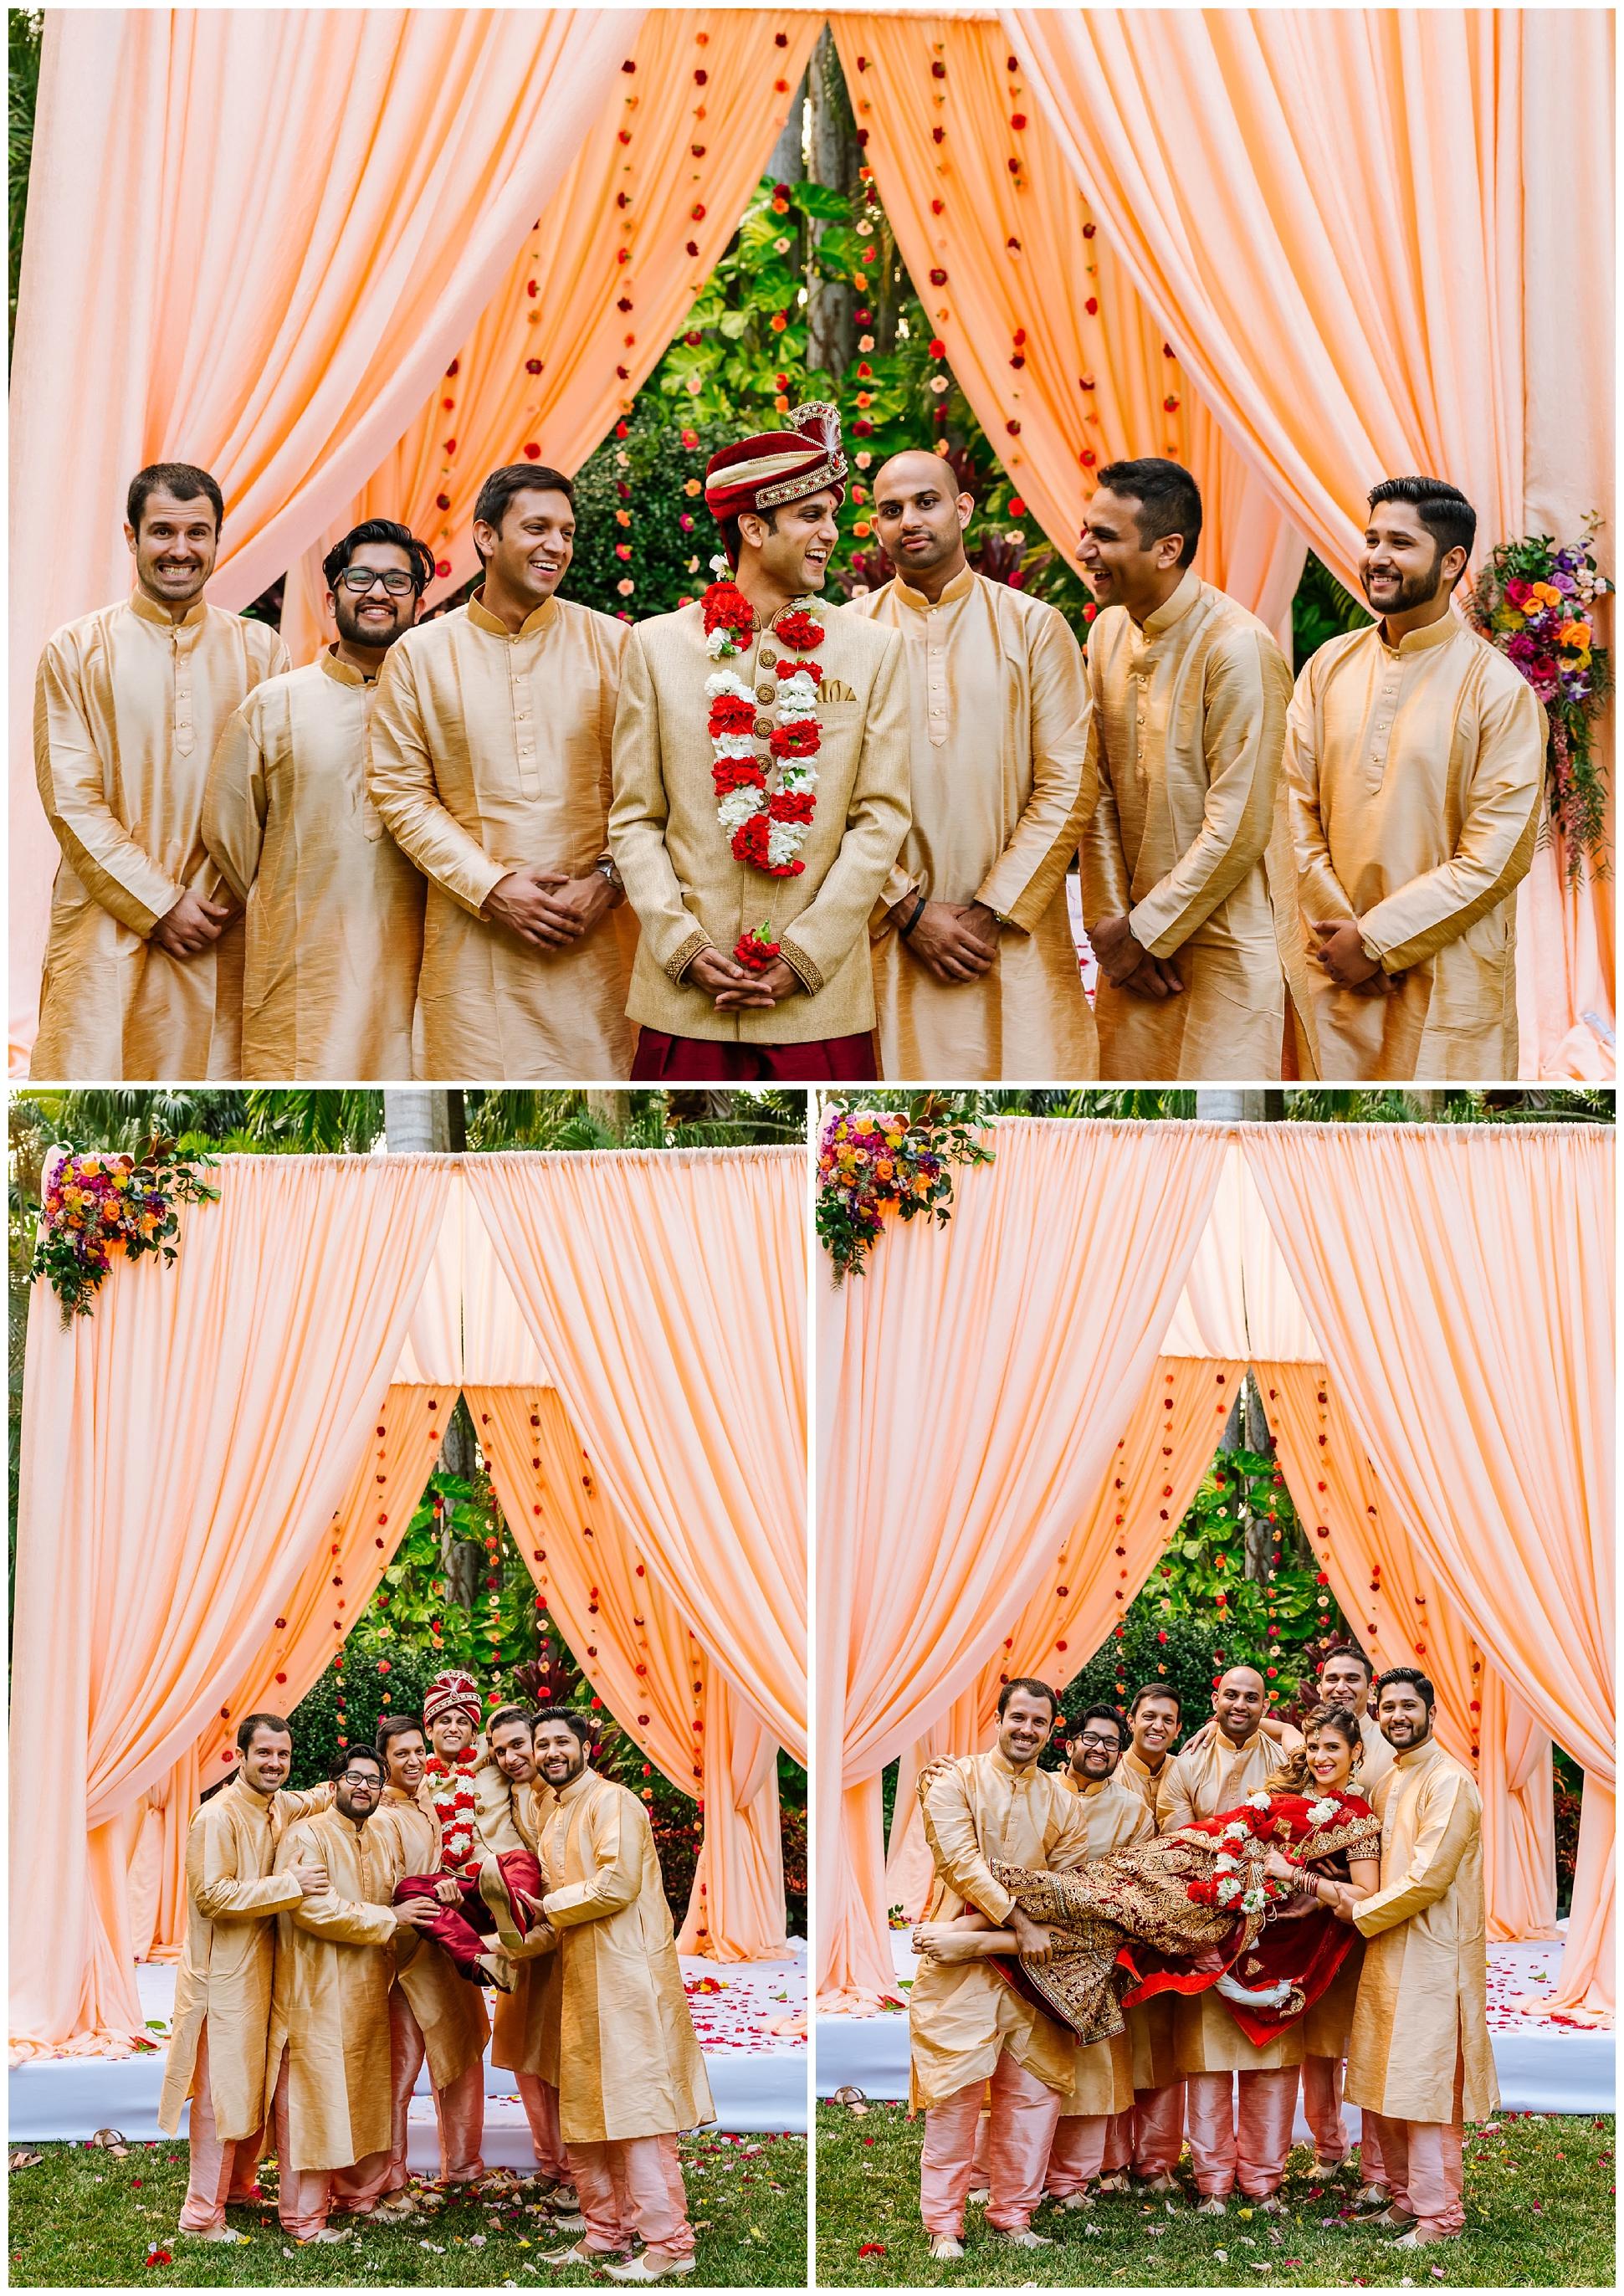 St-pete-indian-wedding-photographer-barat-sunken-gardens_0129.jpg